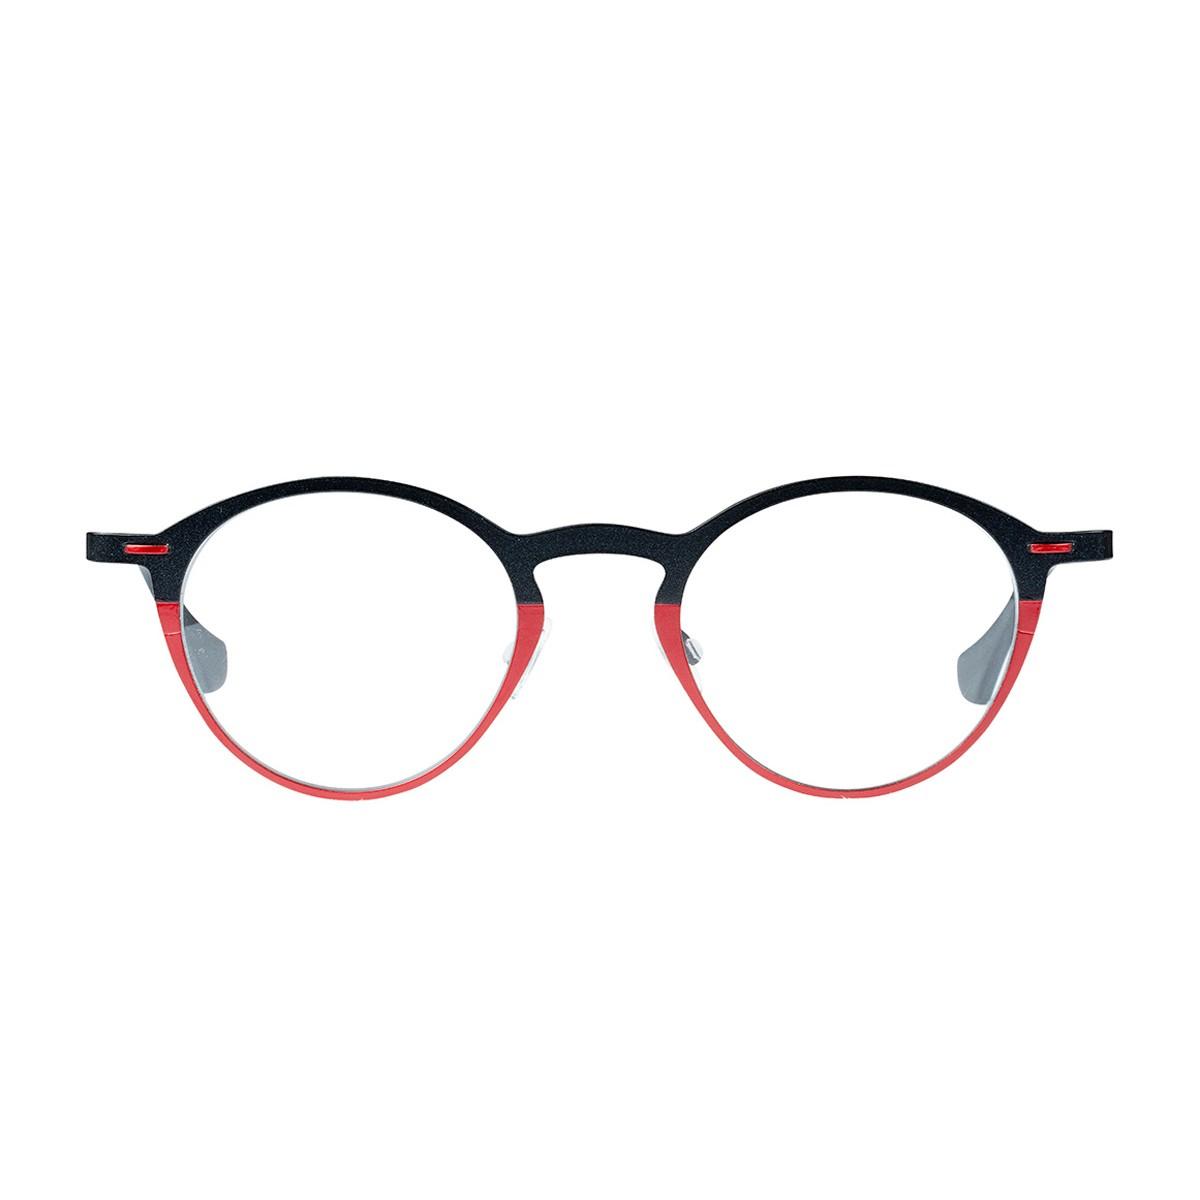 Matttew Mango | Occhiali da vista Unisex